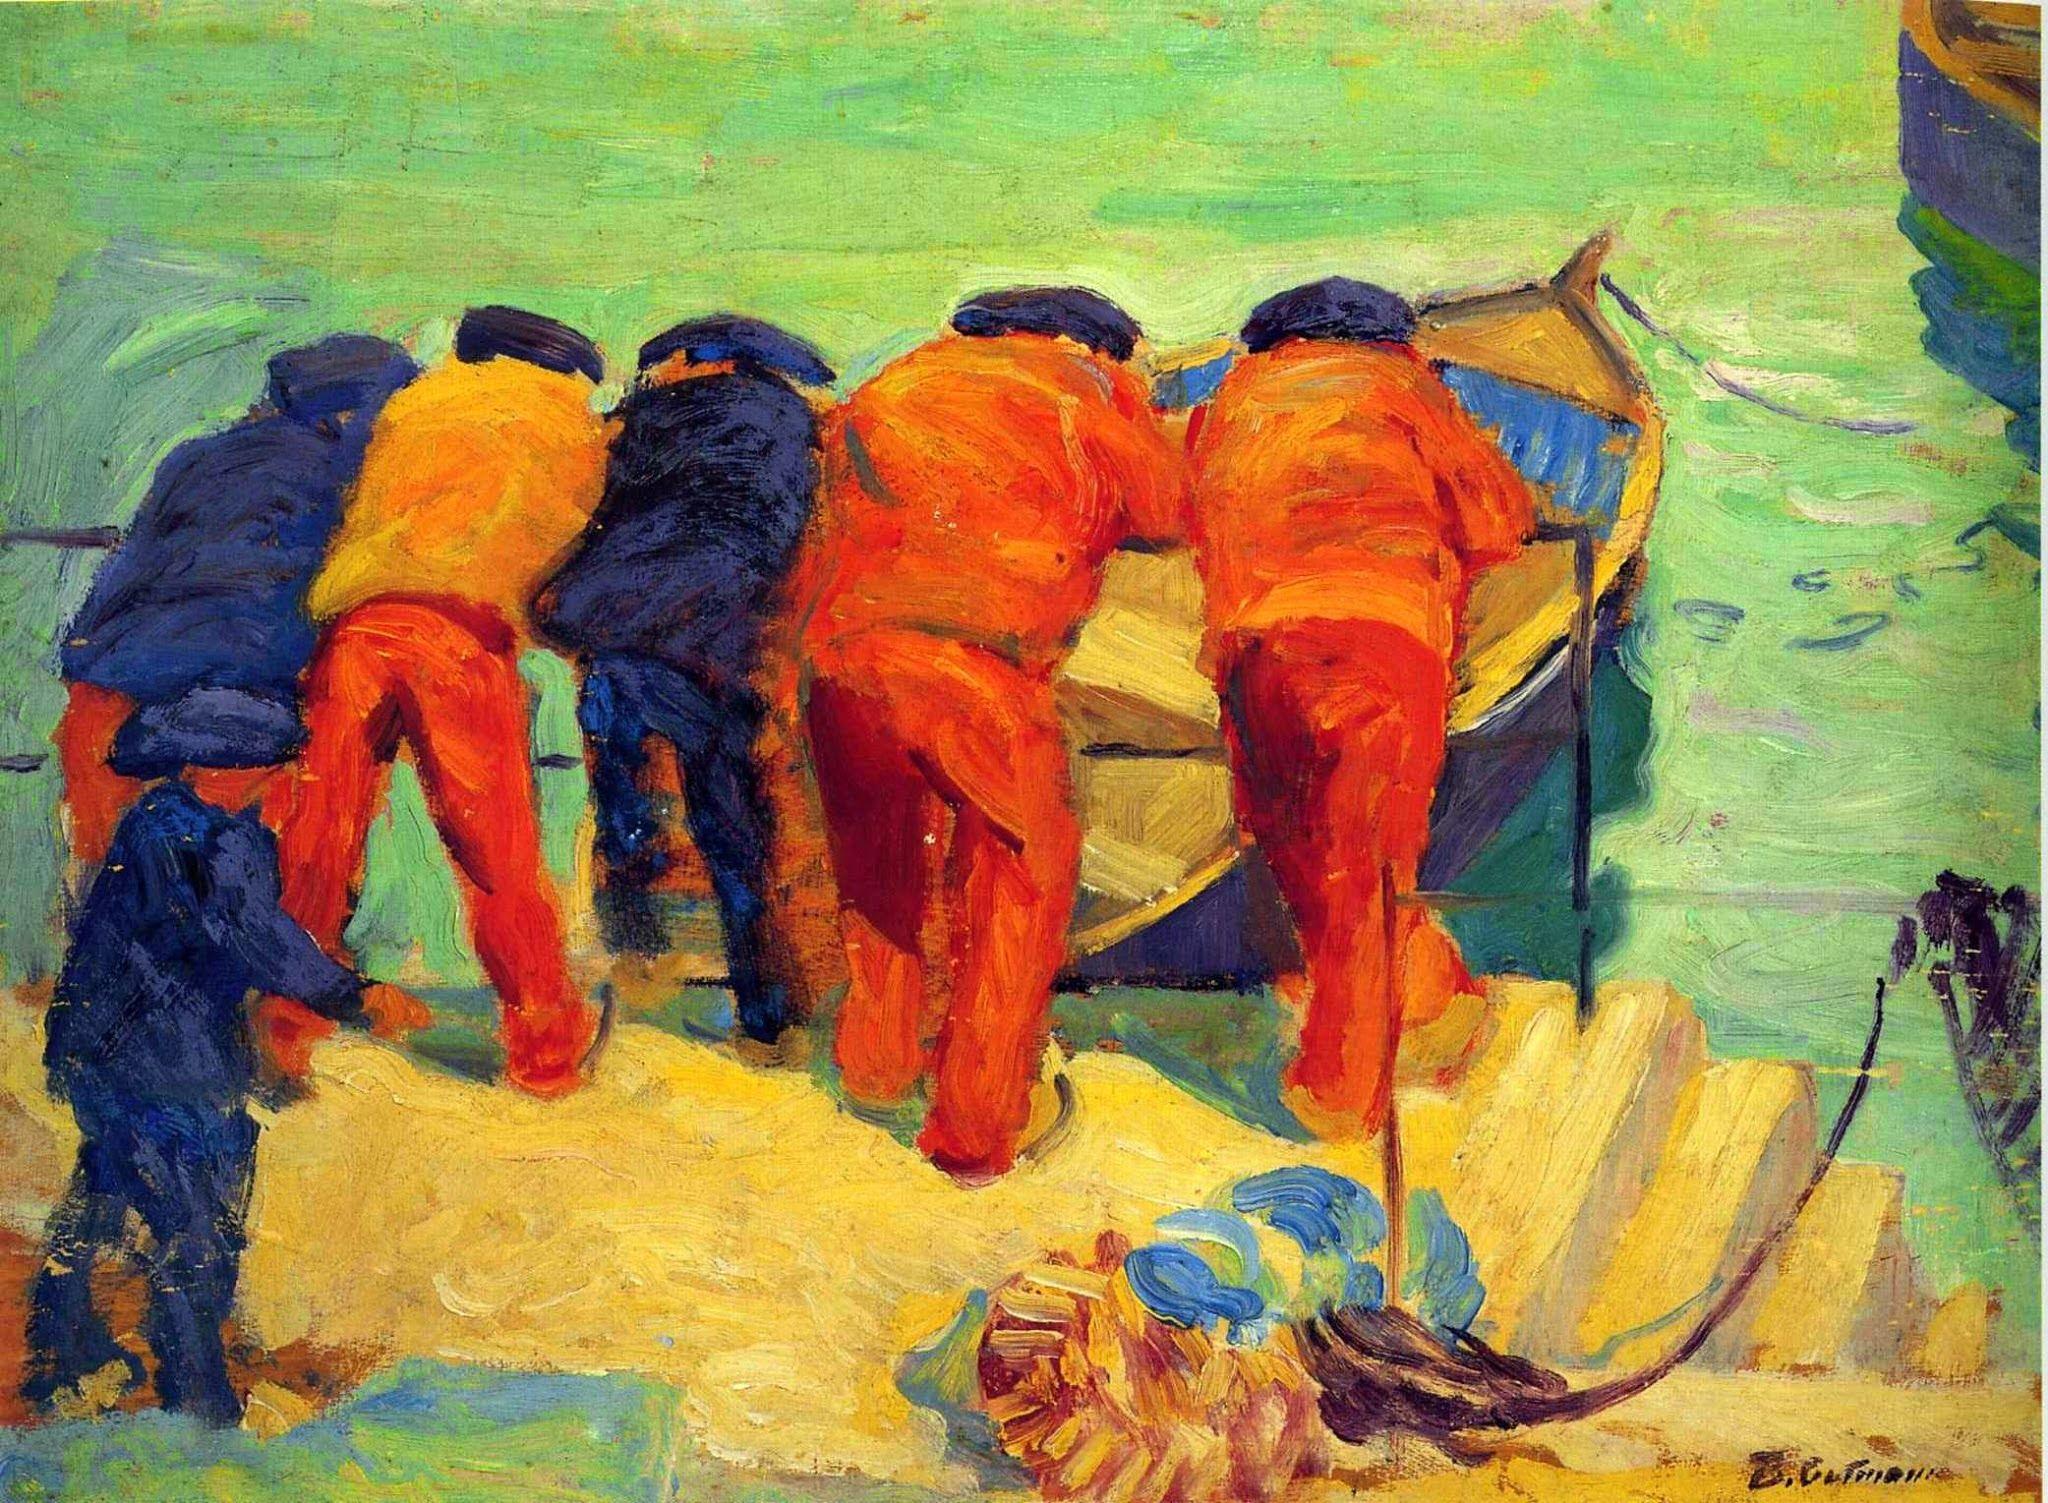 Bernhard Gutmann American Impressionism Paintings